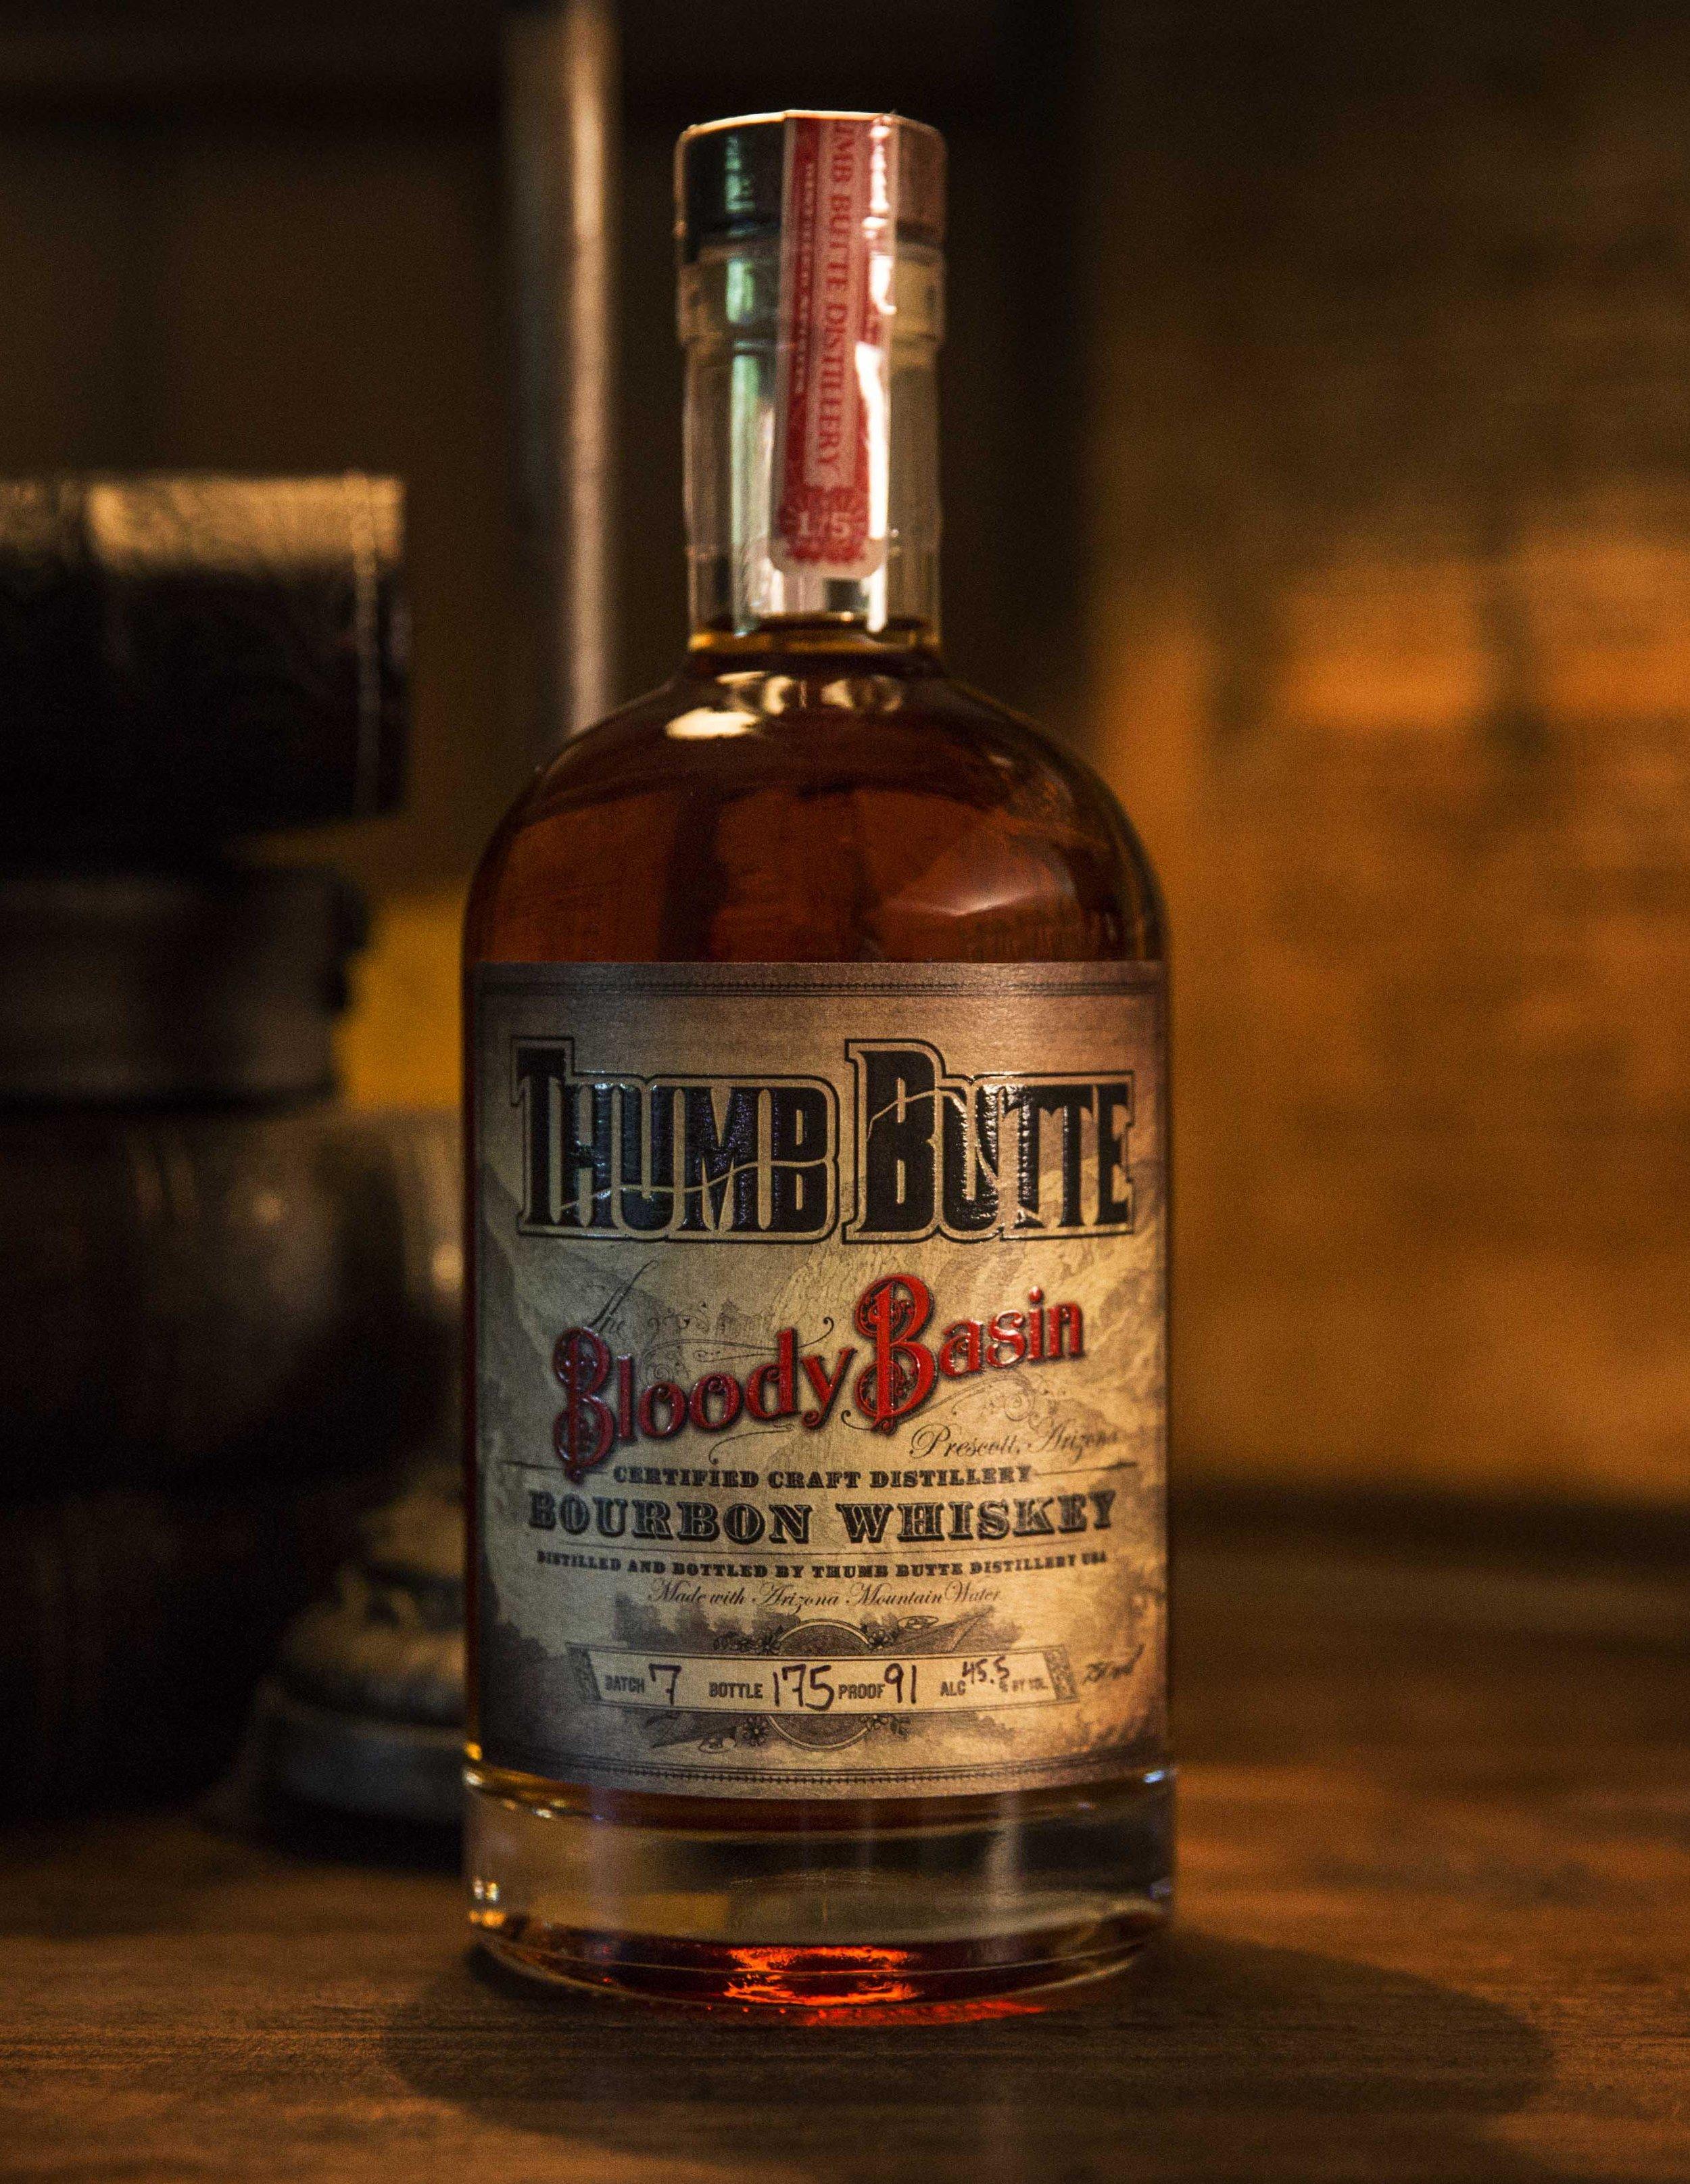 Bottle label design for Thumb Butte Distillery Blood Basin Bourbon Whiskey